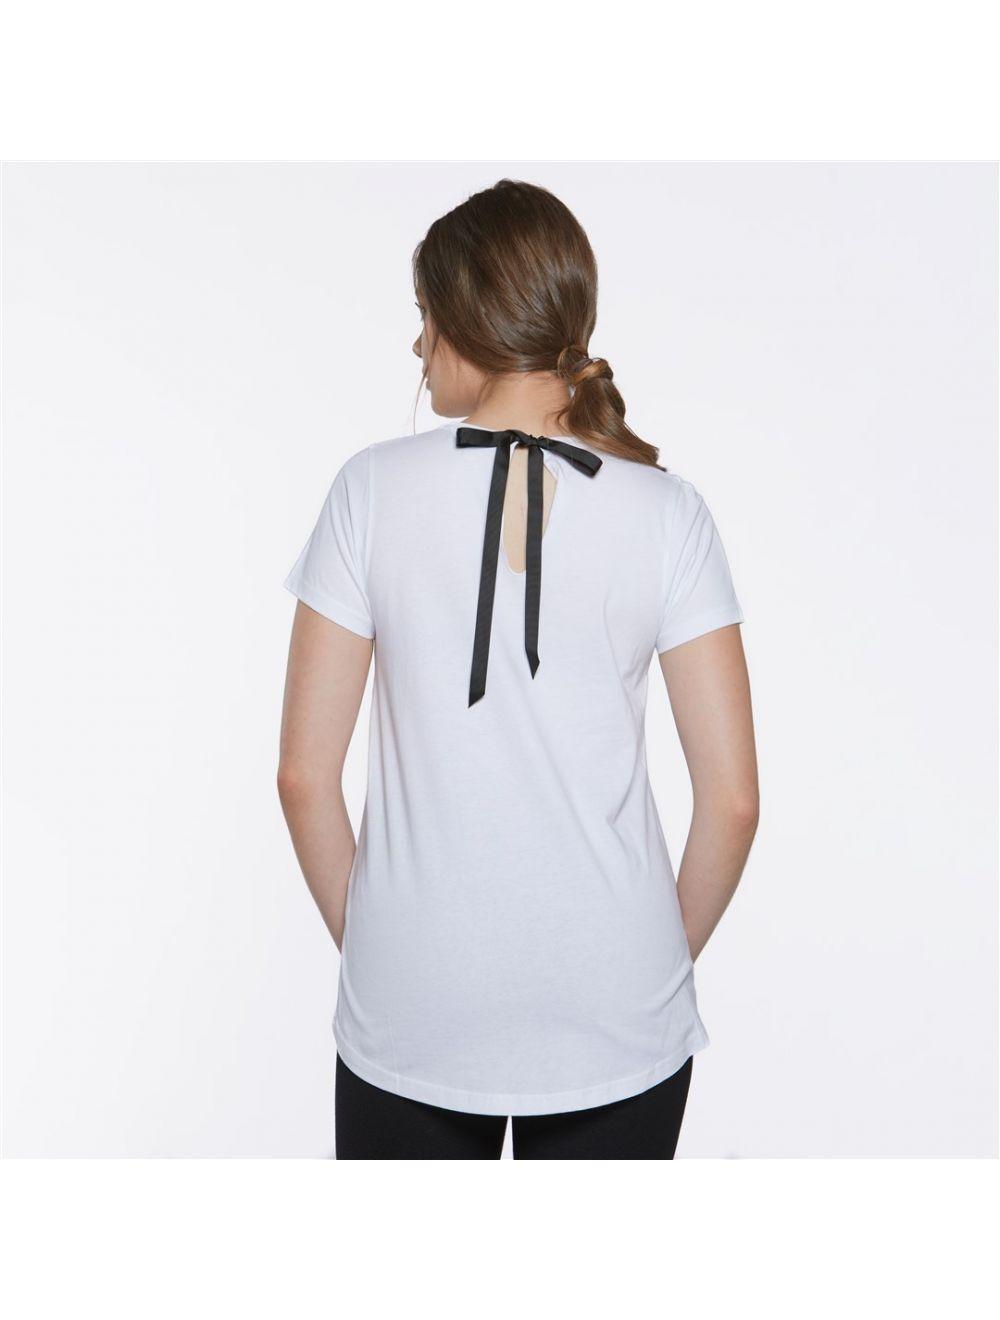 camiseta-blanca-lazo-negro